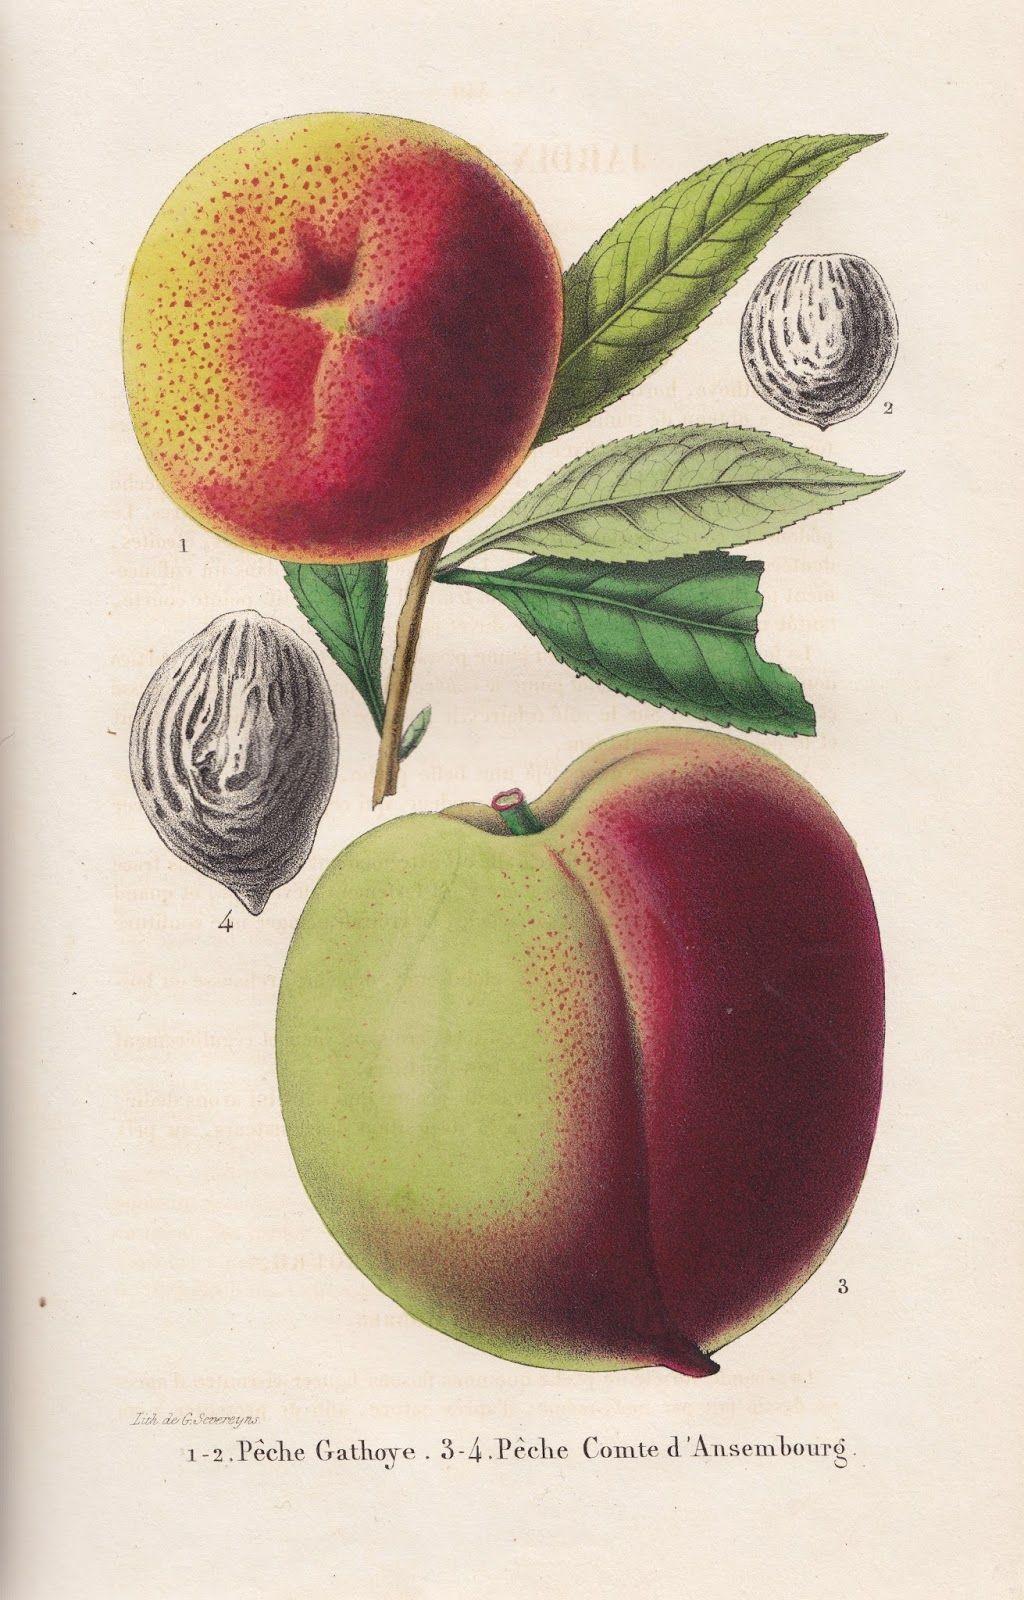 Free Vintage Botanical Printable Peach http://stores.ebay.com/SANDTIQUE-Rare-Prints